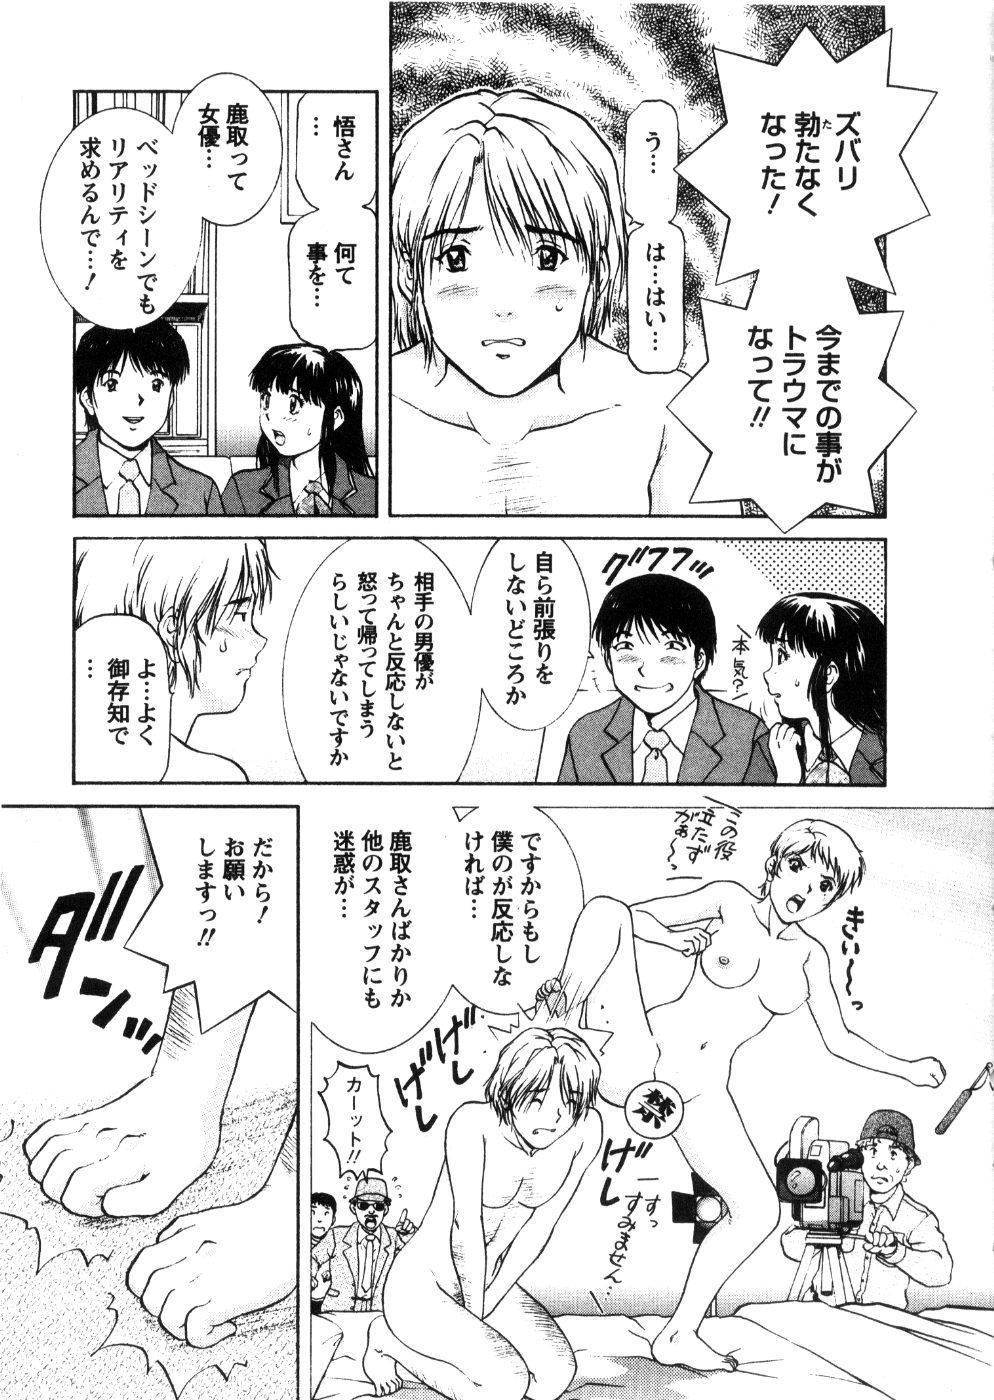 Oneechan-tachi ga Yatte Kuru 03 160